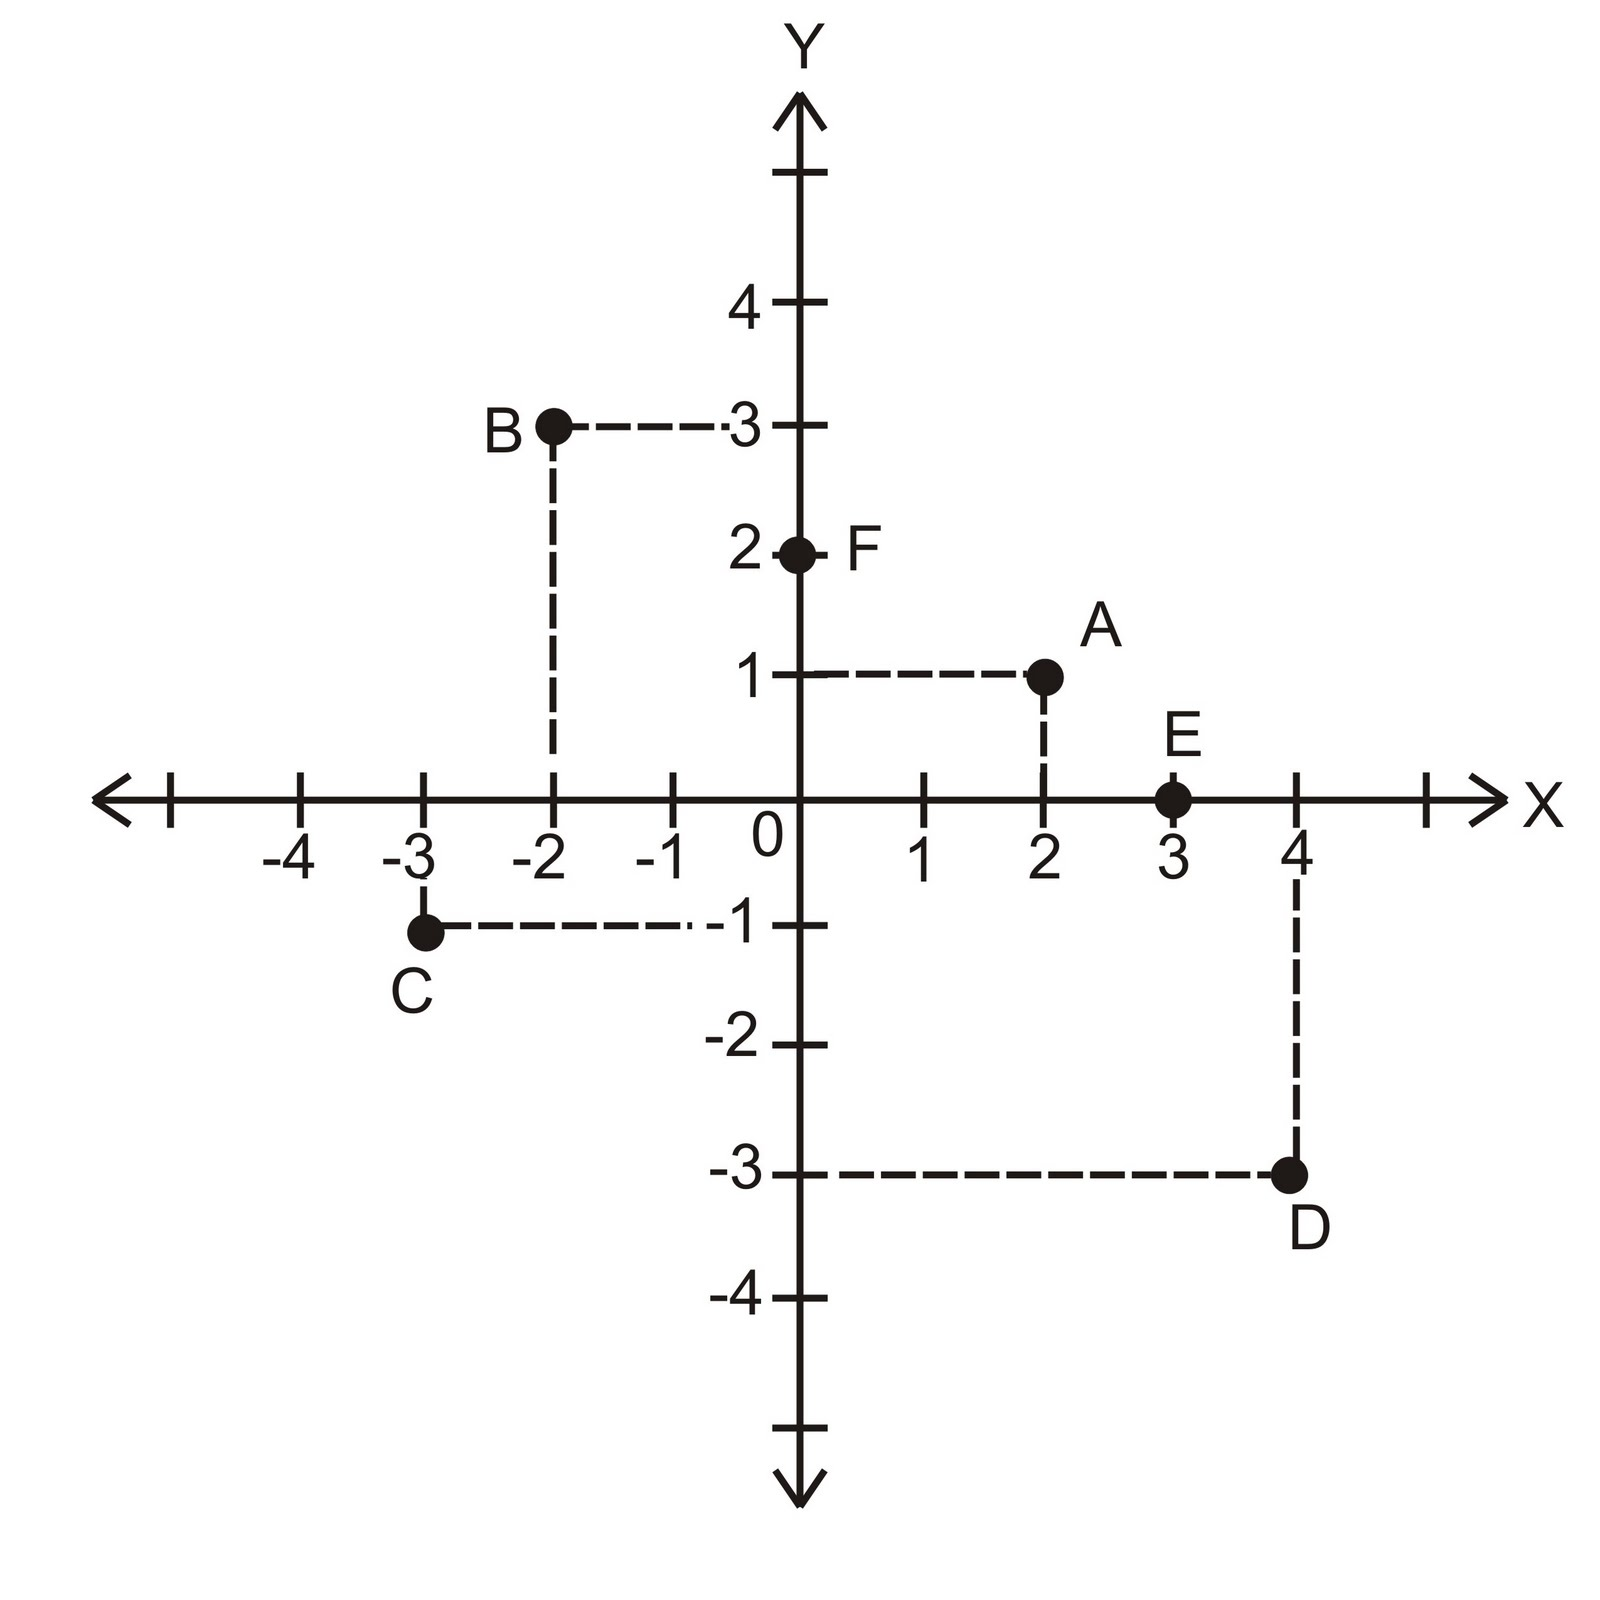 Ai saripah matematika 09511060 persamaan garis setelah memahami bagaimana cara menggambar titik pada bidang koordinat cartesius sekarang bagaimana cara menggambar garis lurus pada bidang yang sama ccuart Gallery